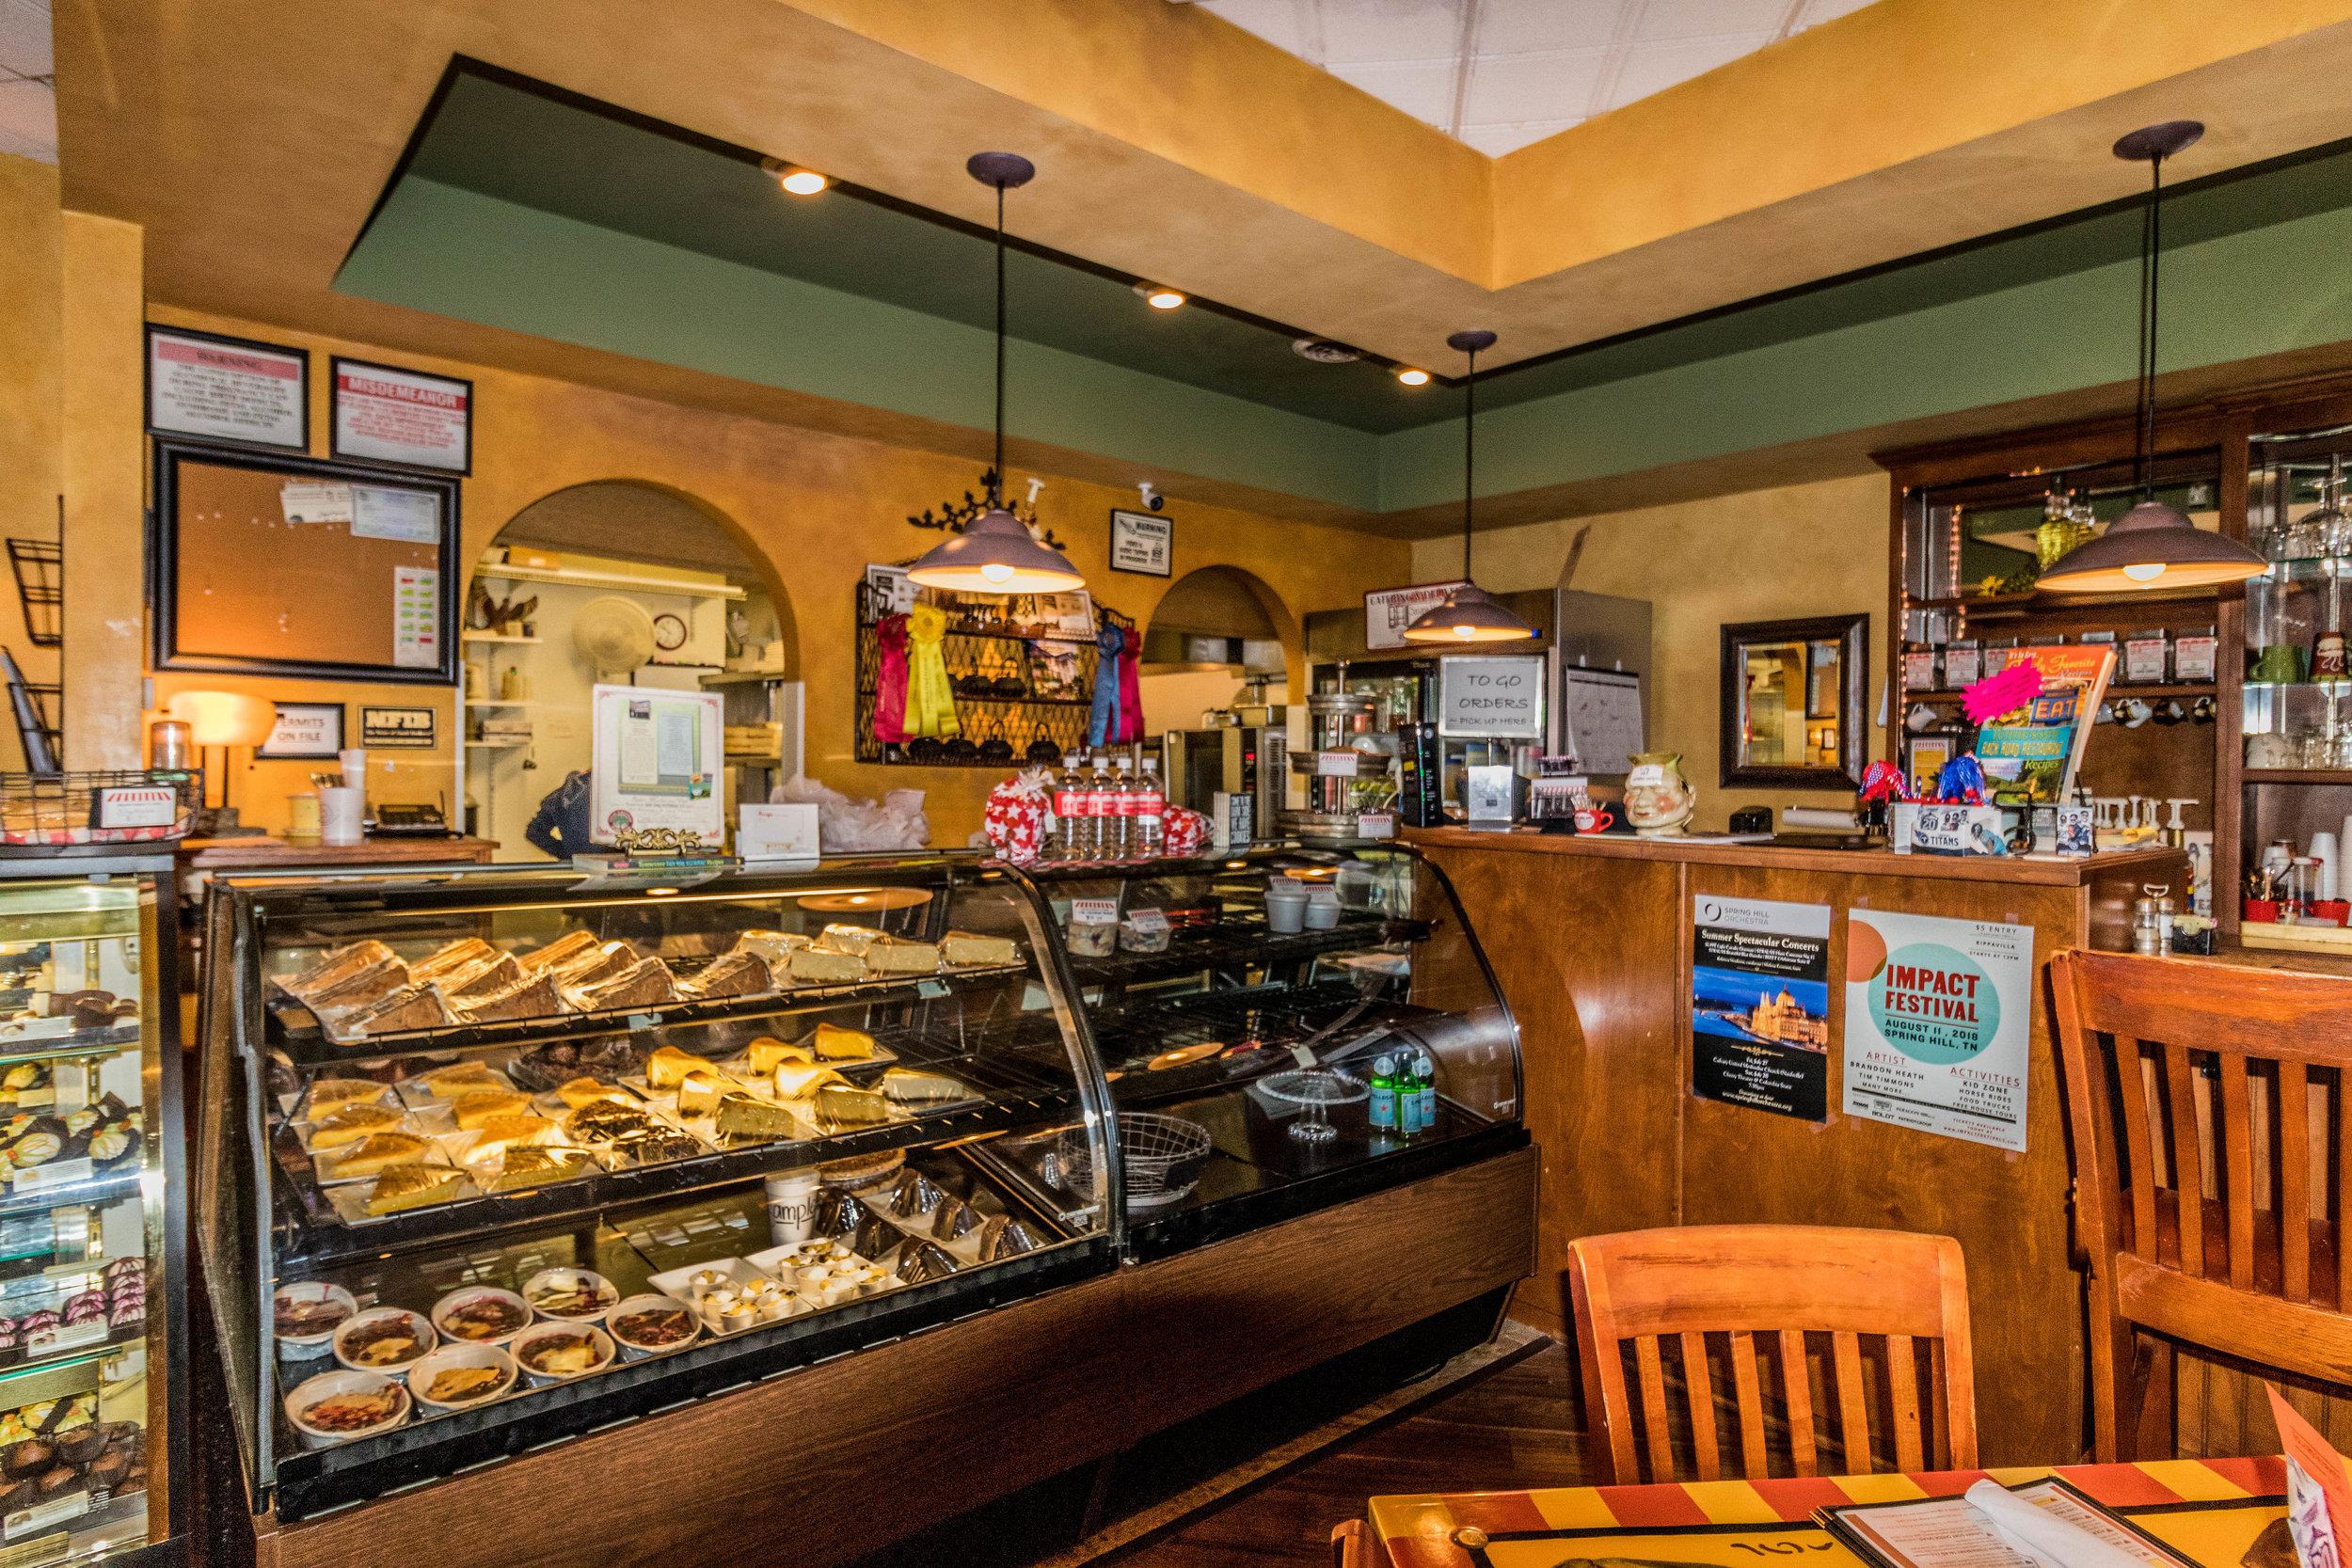 Square Market & Cafe Columbia, TN